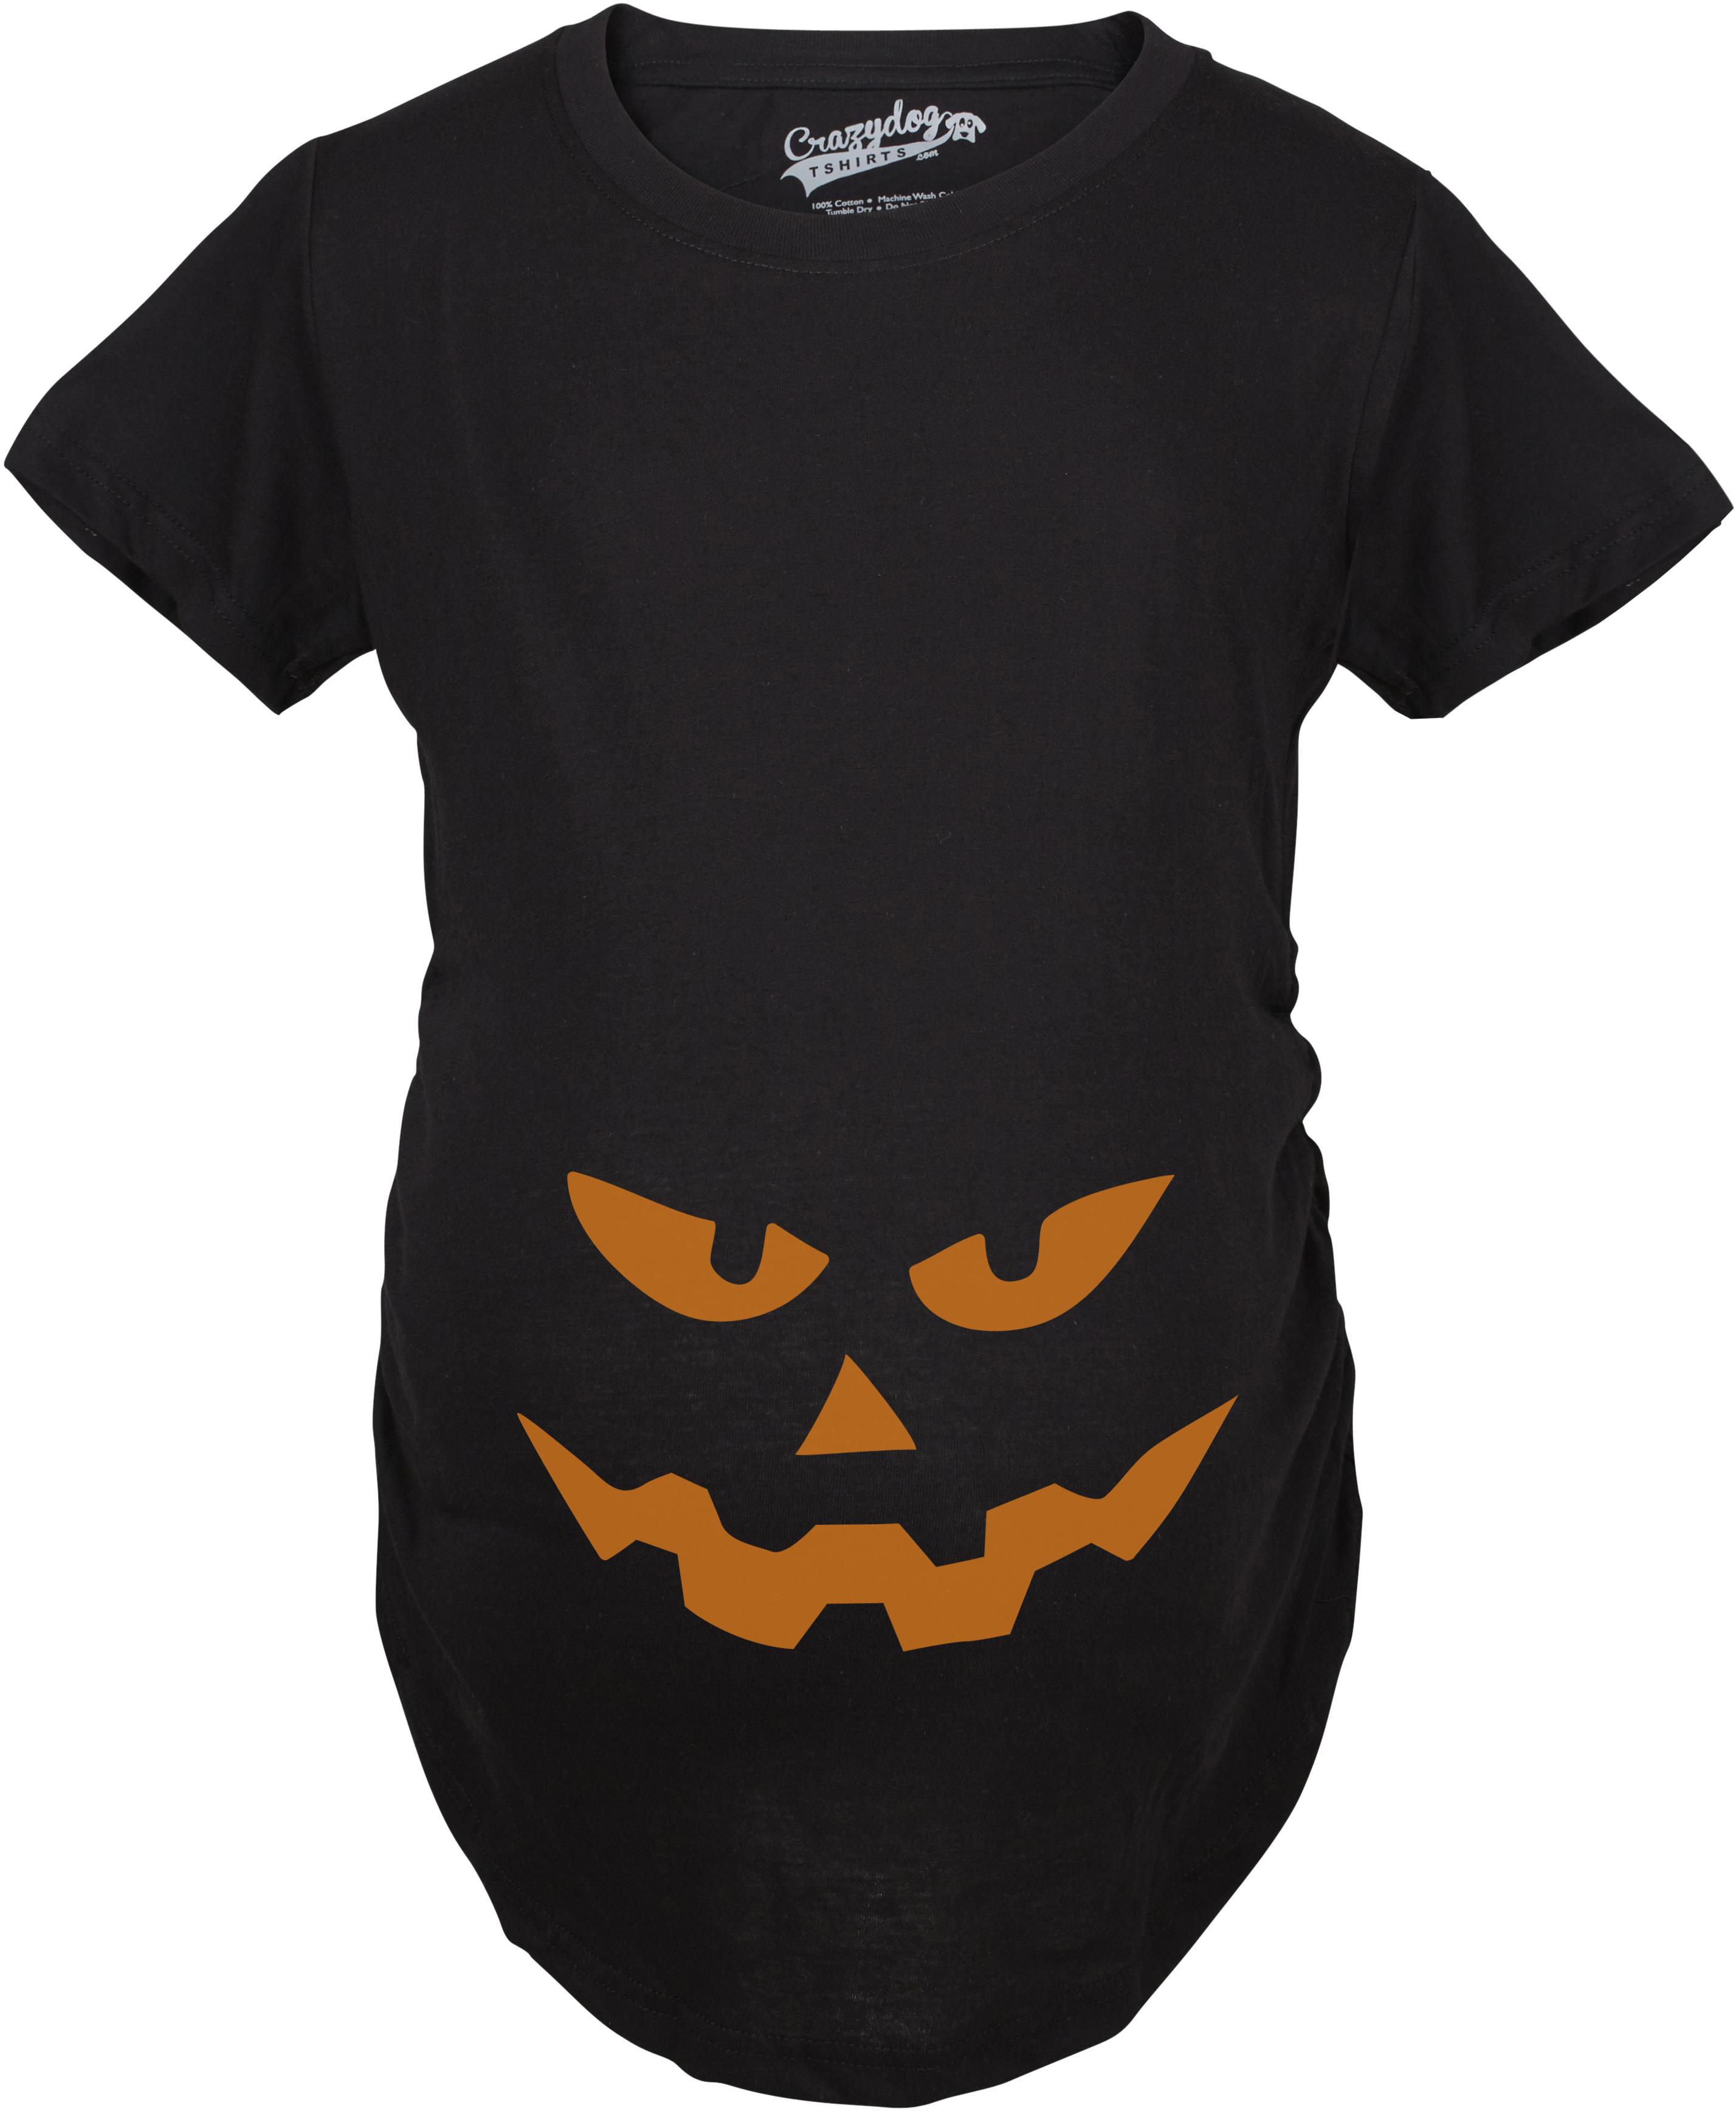 e1bccd00607e8 Maternity Triangle Nose Pumpkin Face Halloween Pregnancy Announcement T  shirt (Black) S